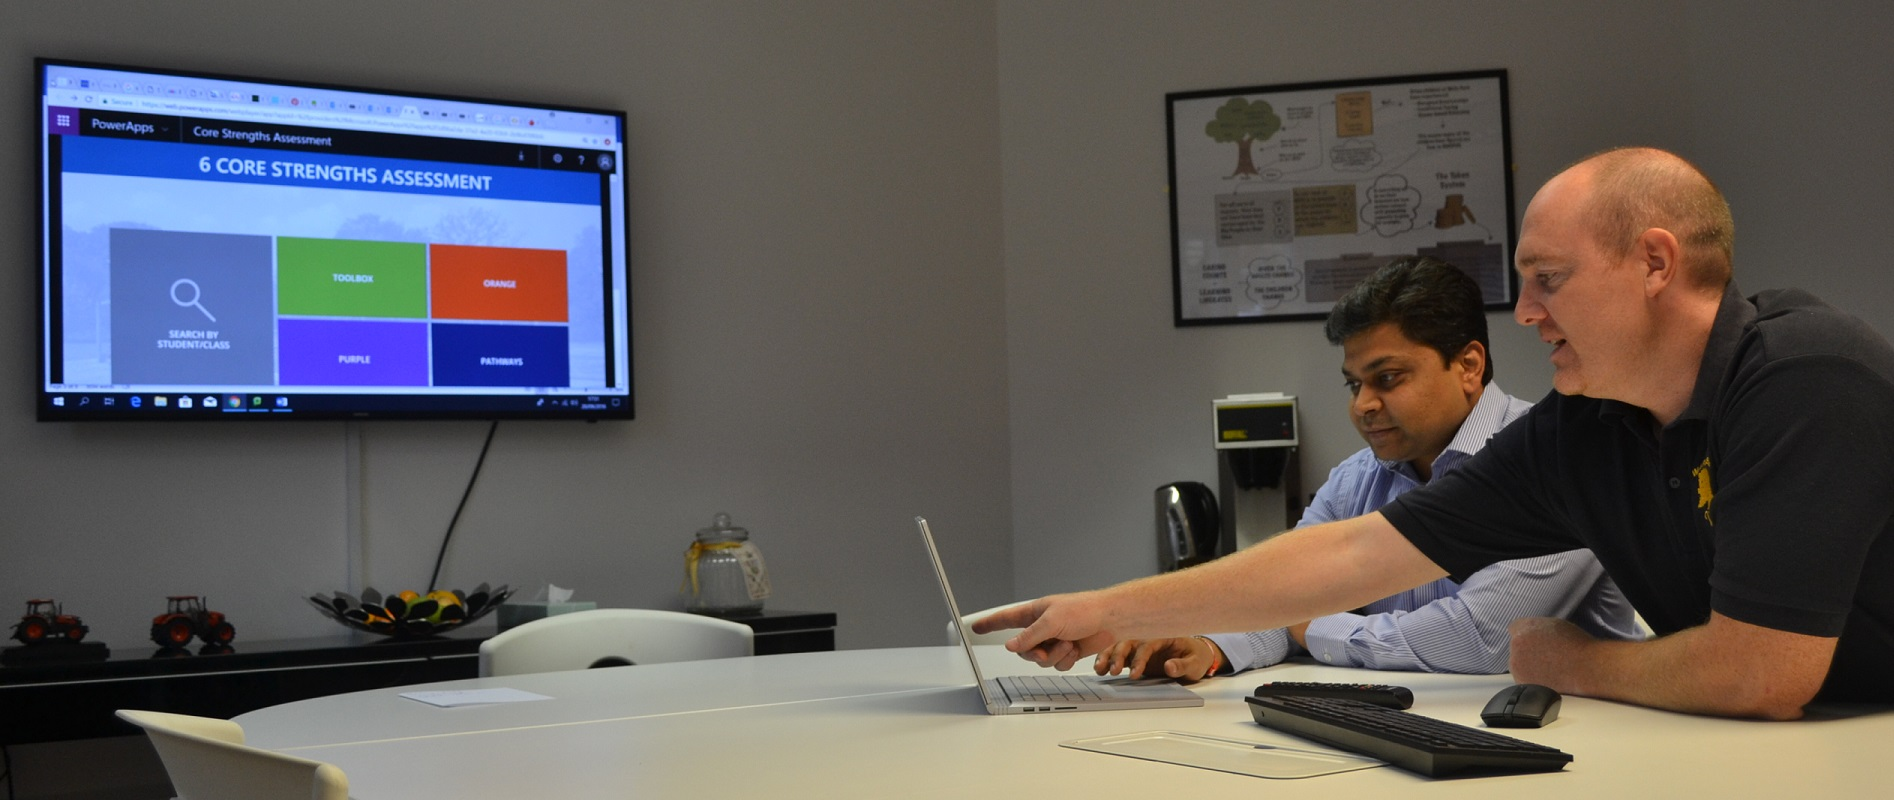 New Office 365 apps transform assessment at Wells Park School